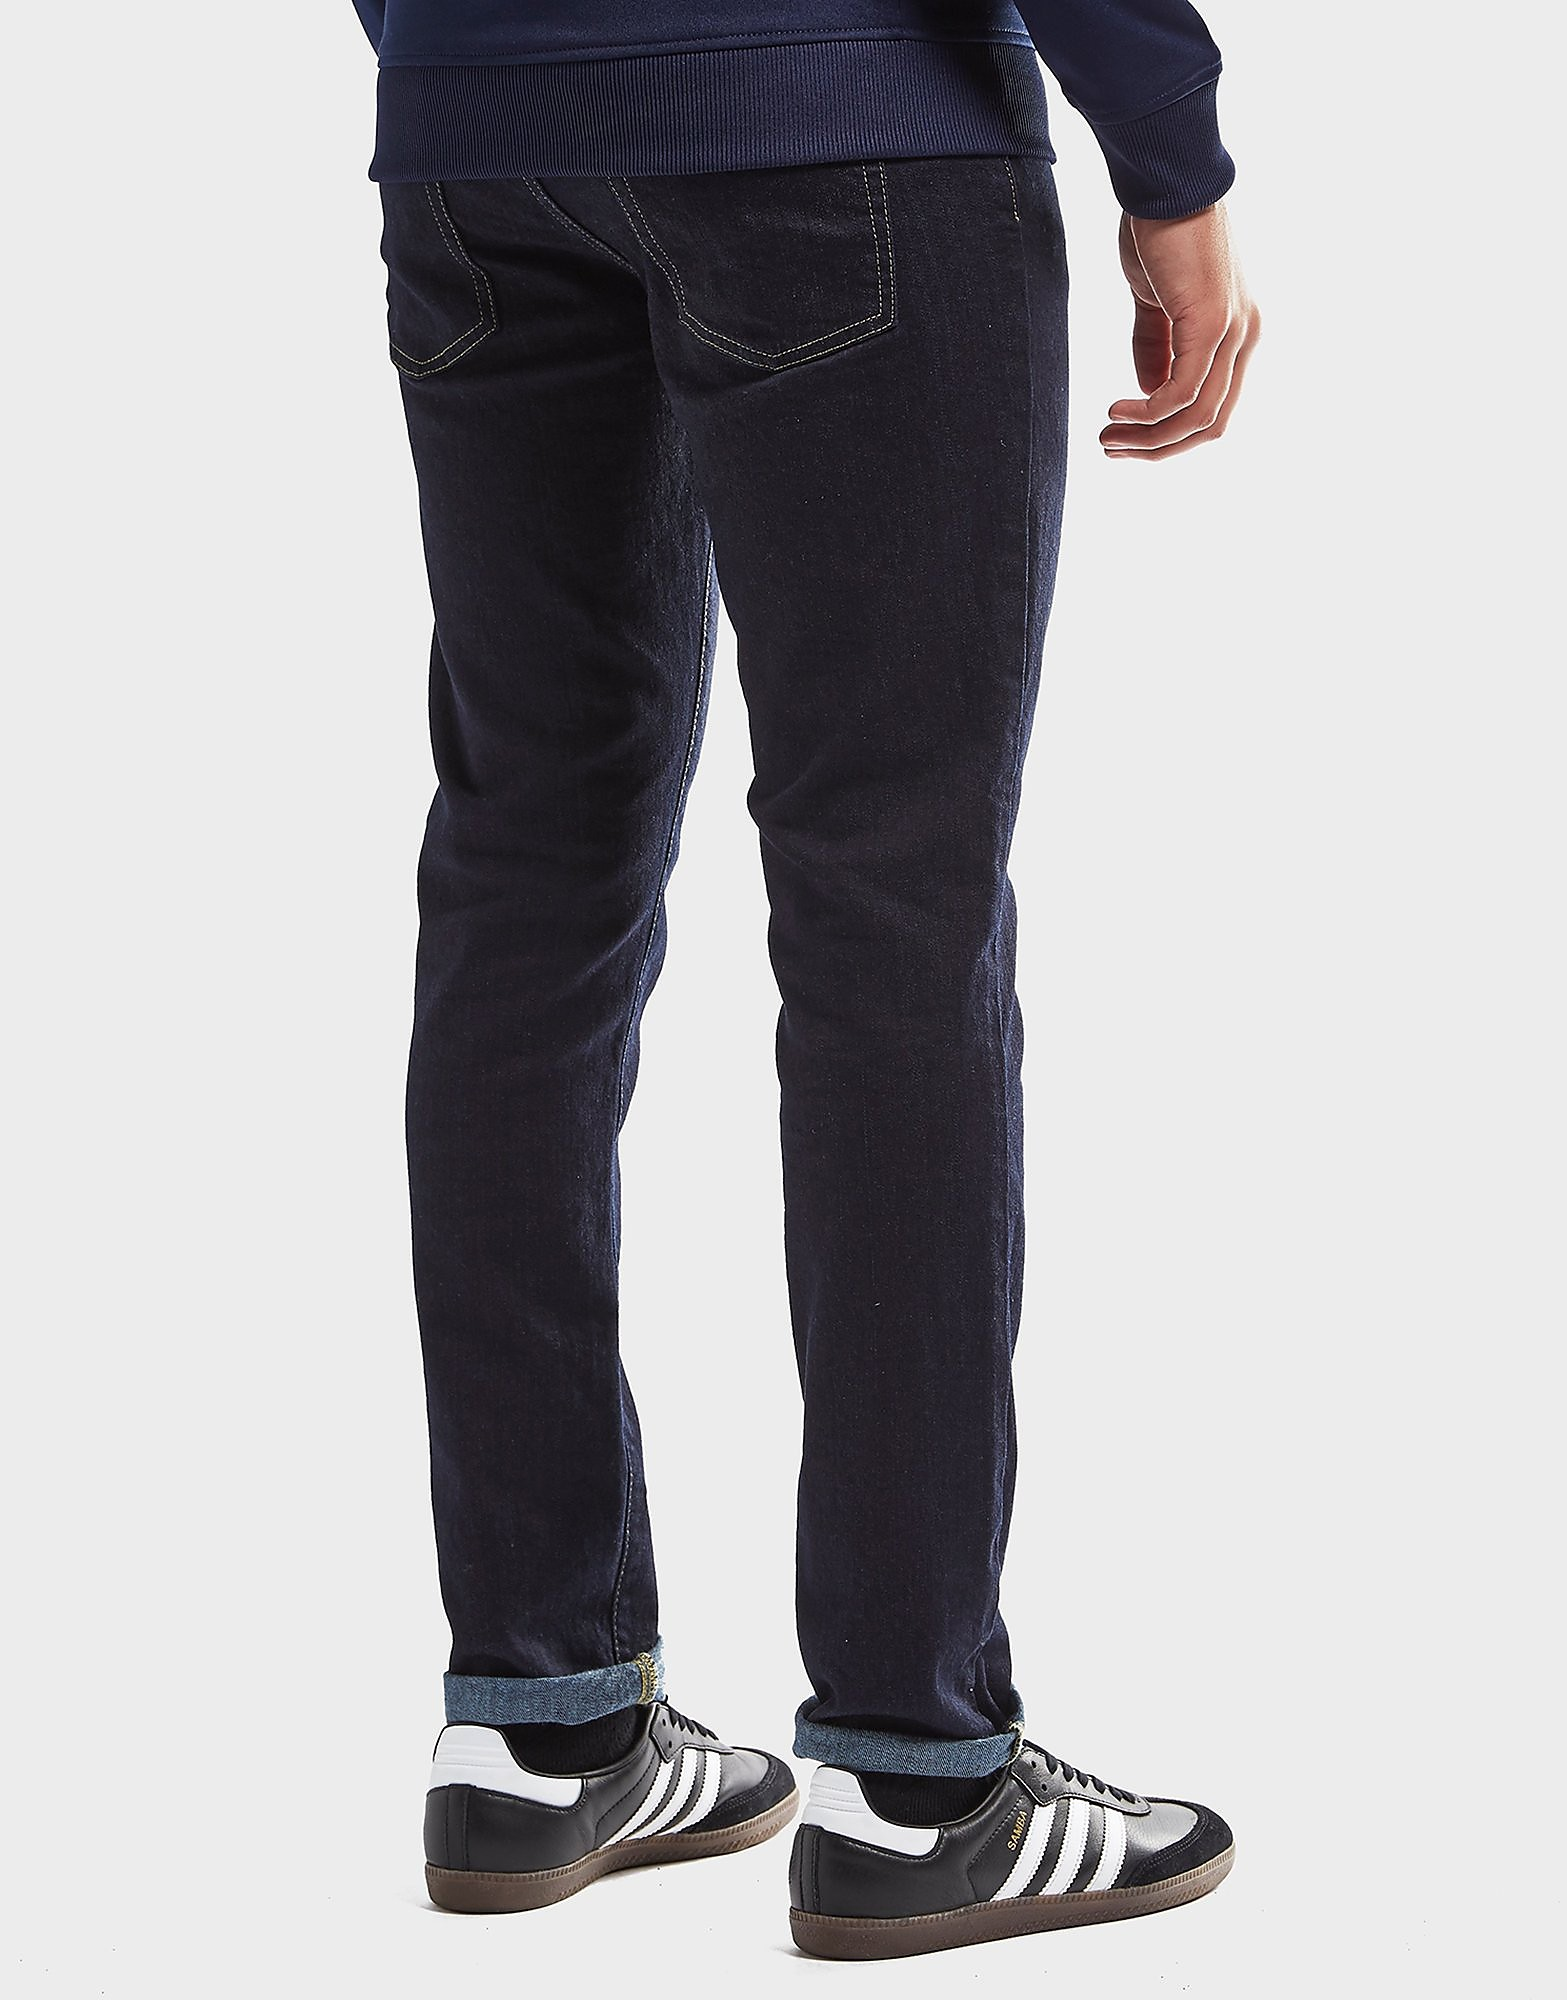 Lyle & Scott Slim Jeans